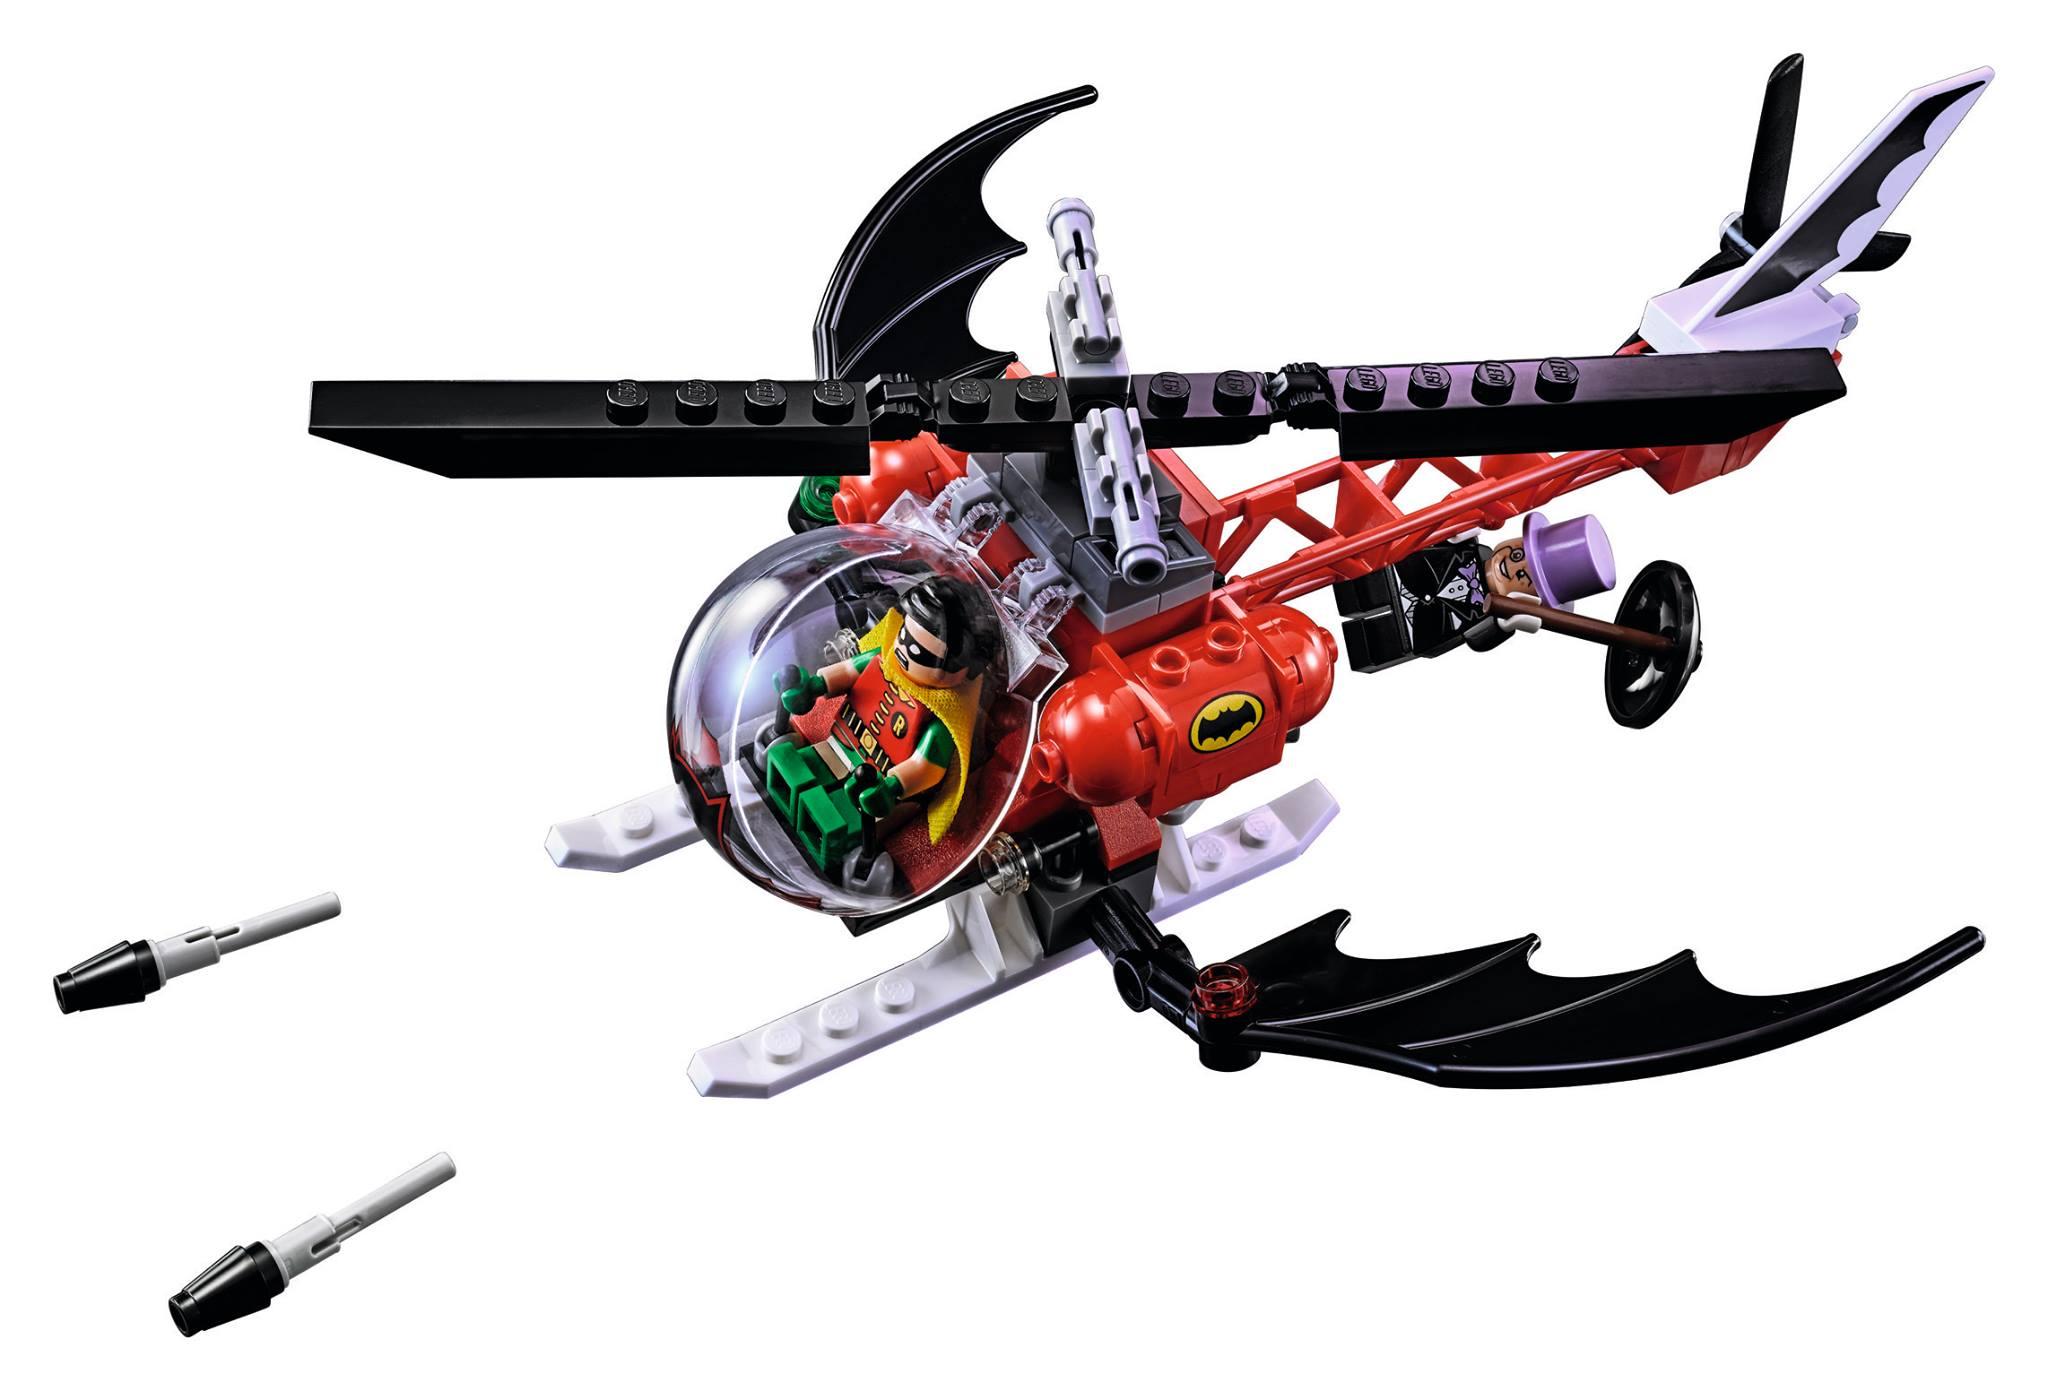 El Batcopter.